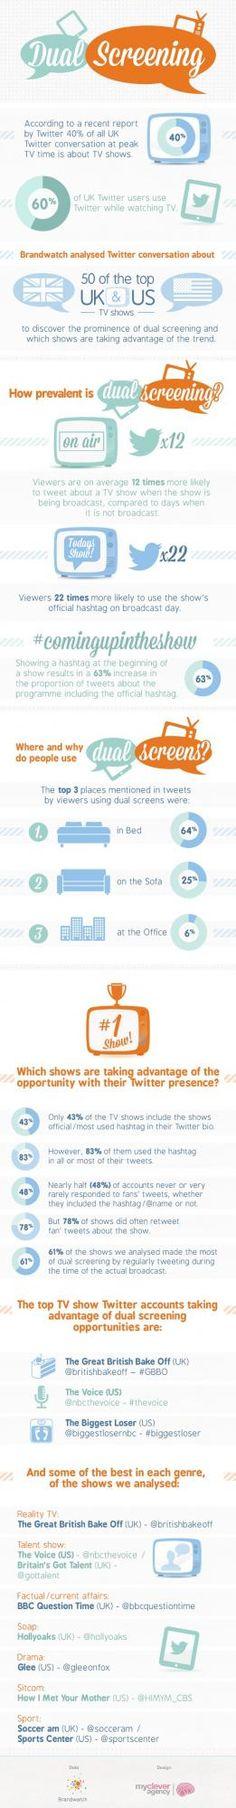 The rise of dual screening